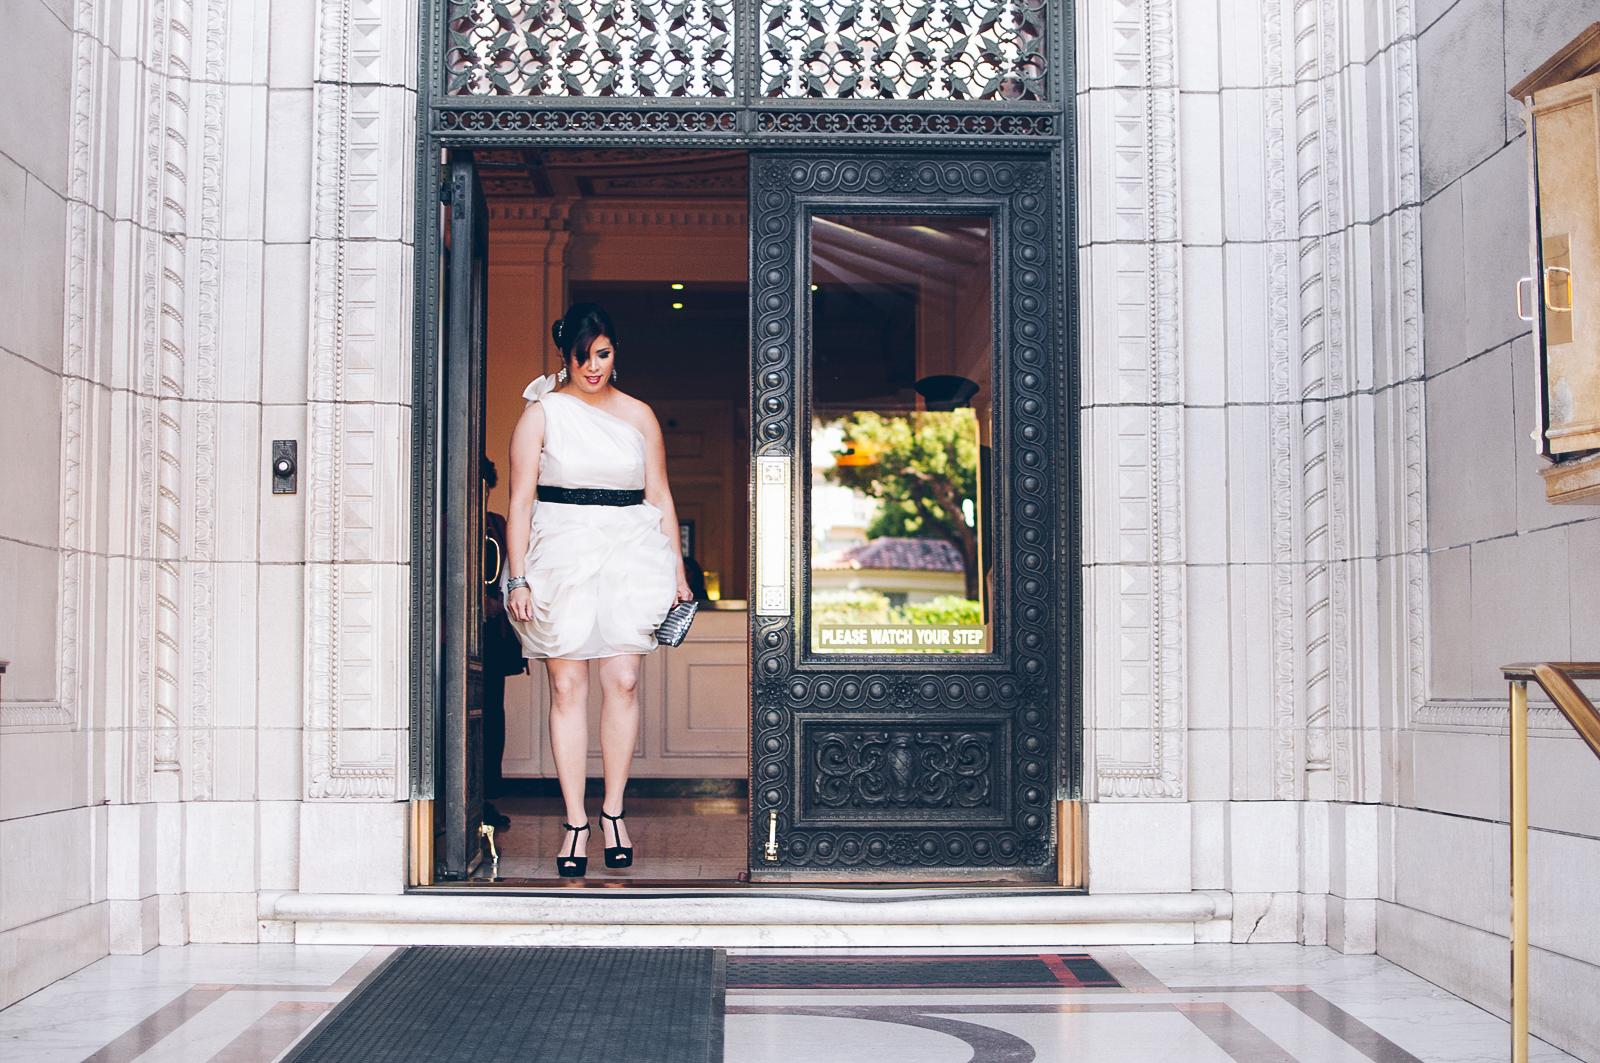 greens_restaurant_wedding_photography_san_franscisco_ebony_siovhan_bokeh_photography_05.jpg